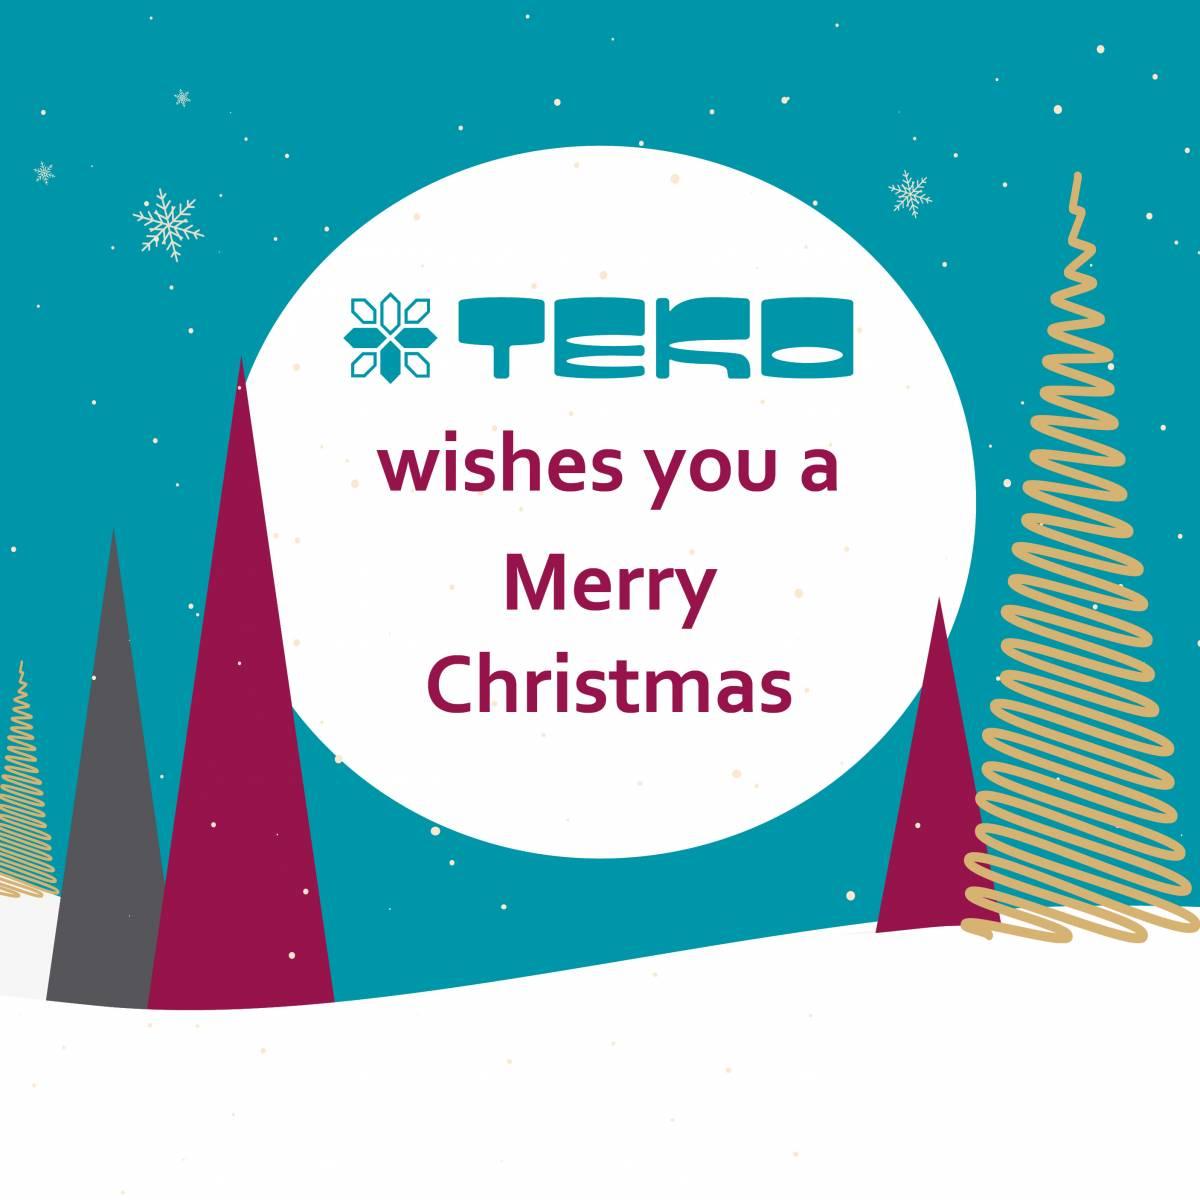 teko news christmas 2019 675x675px - Company holidays 2019-2020